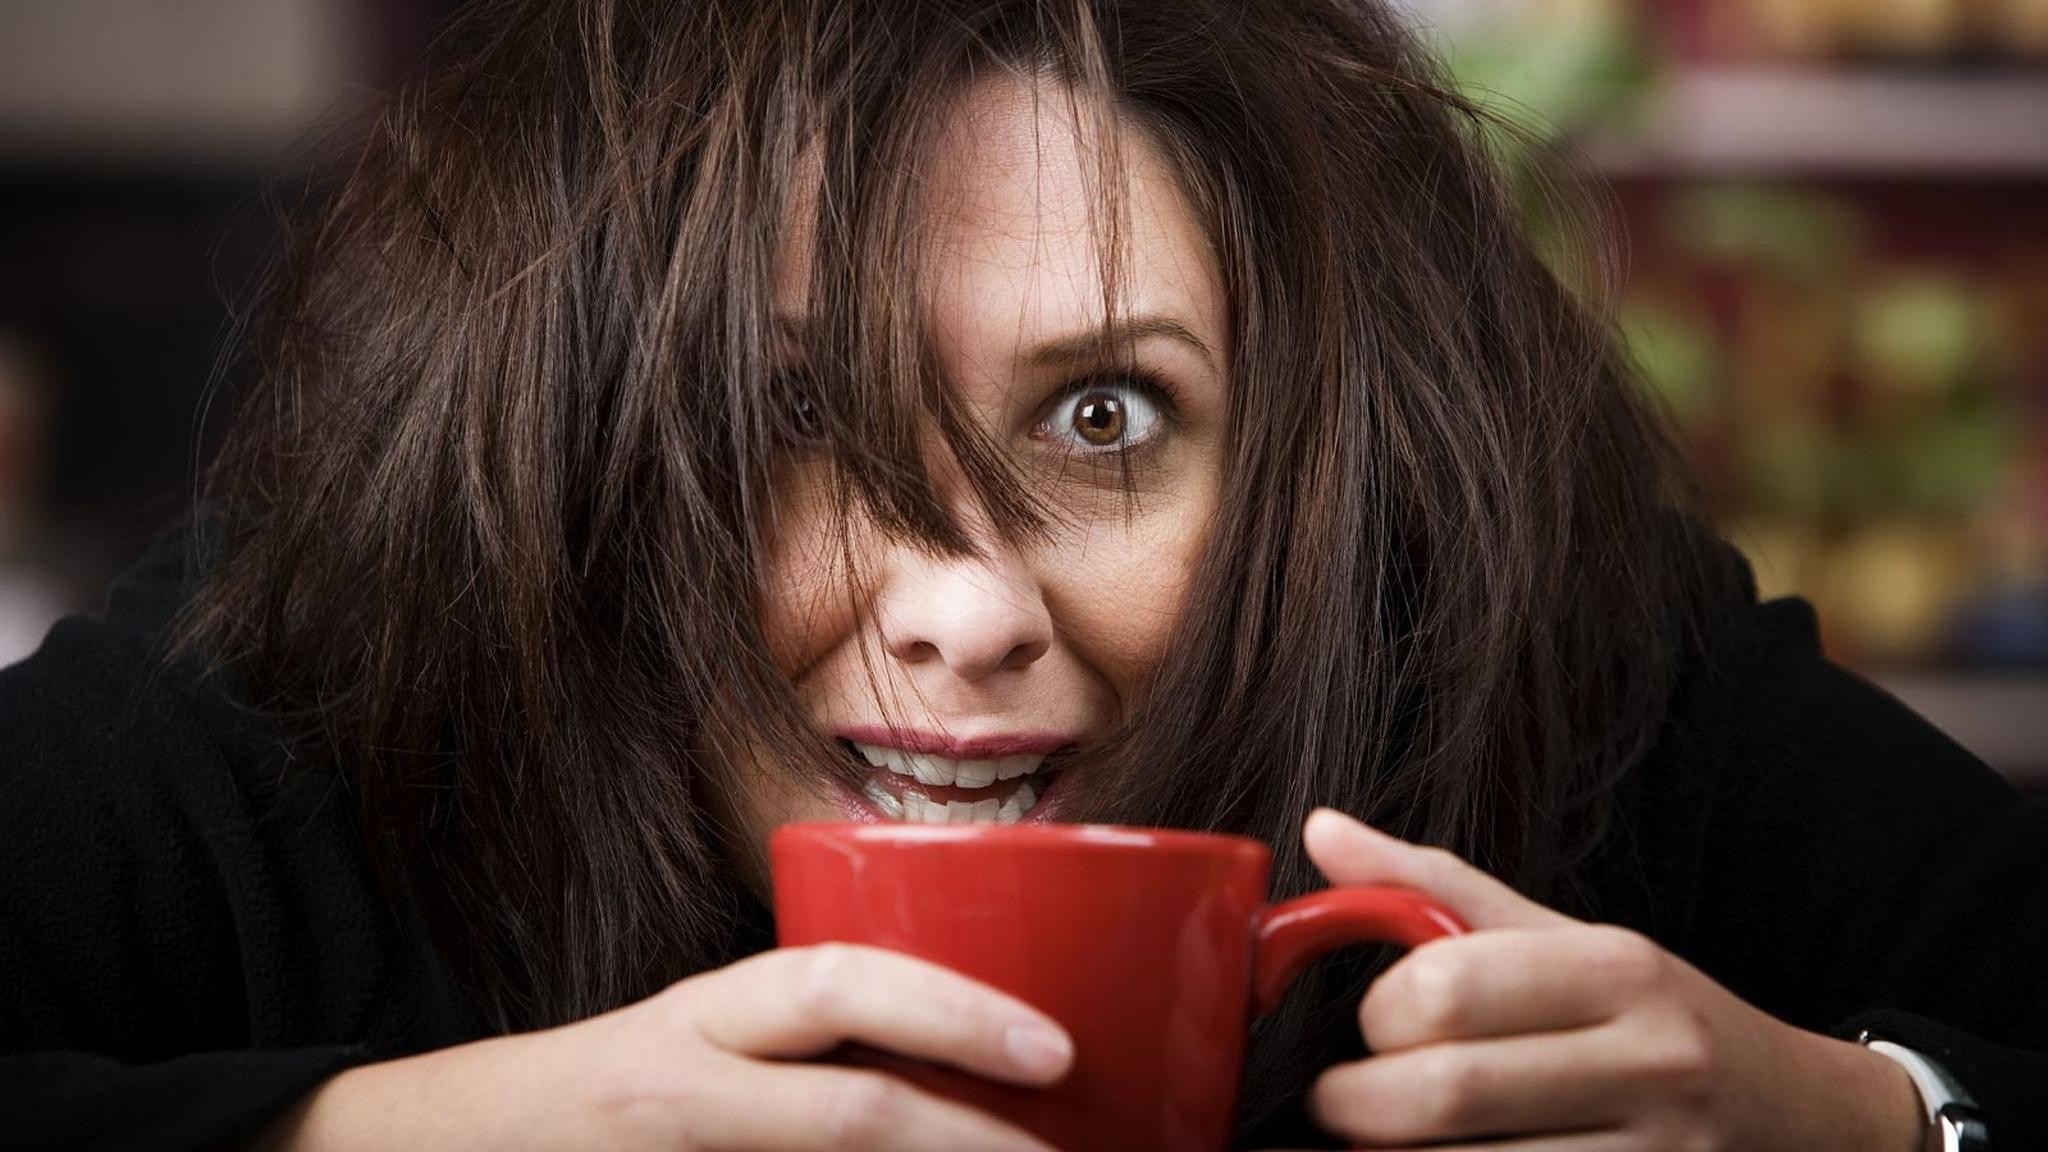 Kaffeesüchtig